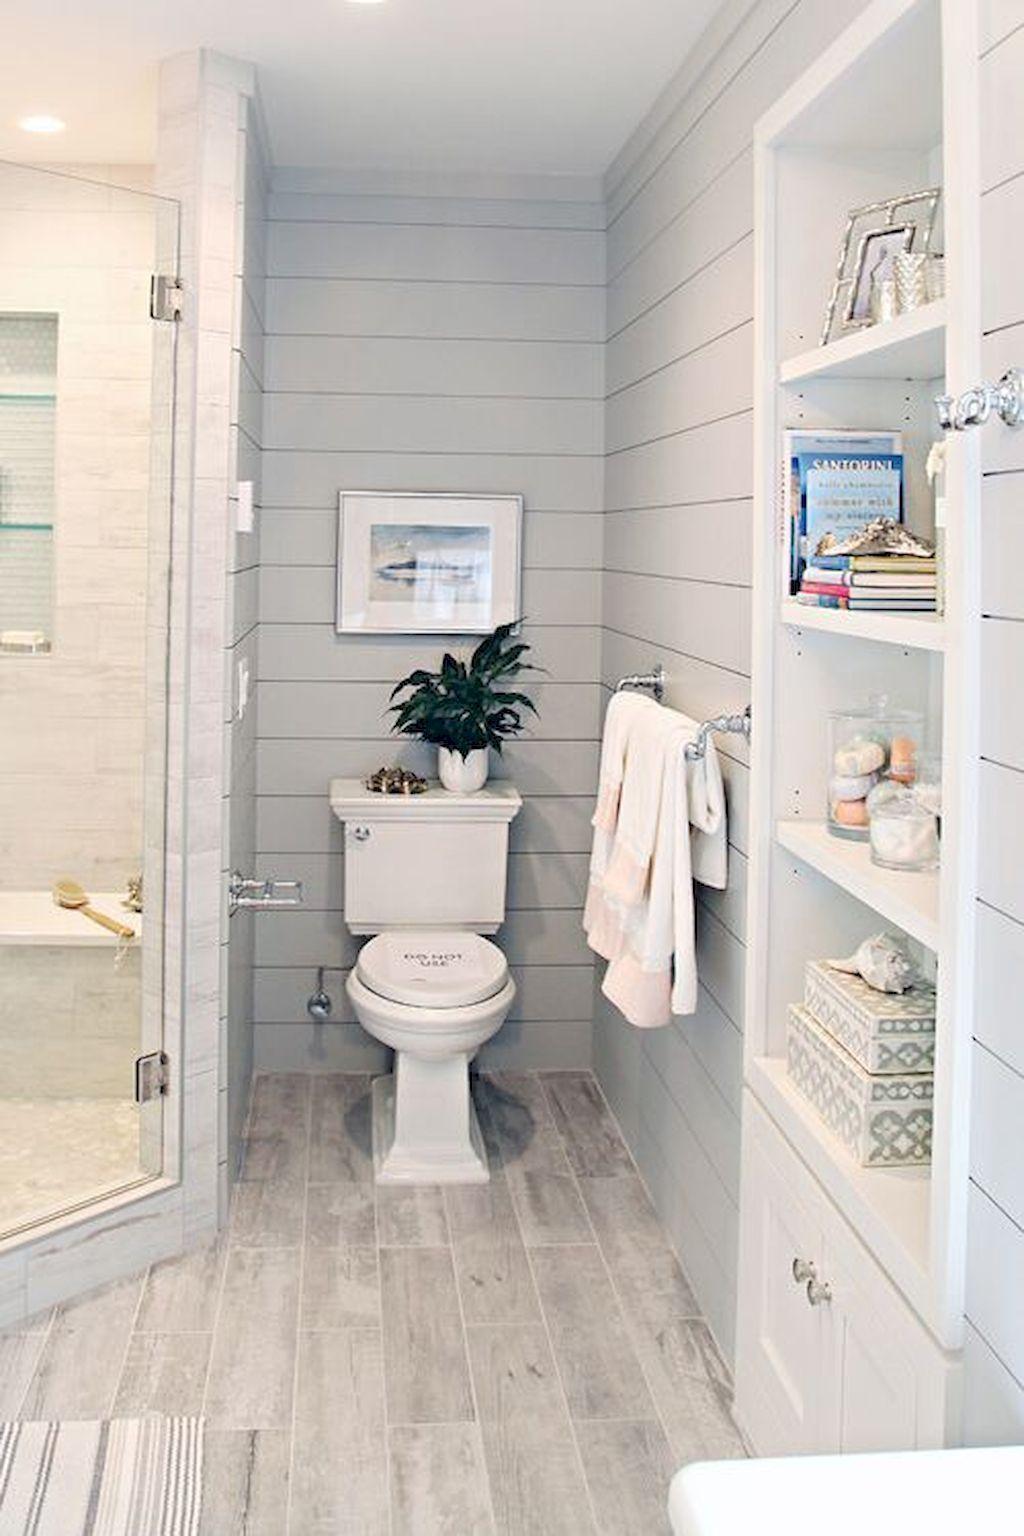 115 Genius Tiny House Bathroom Shower Design Ideas Besideroom Co Bathrooms Remodel Small Bathroom Remodel Small Master Bathroom